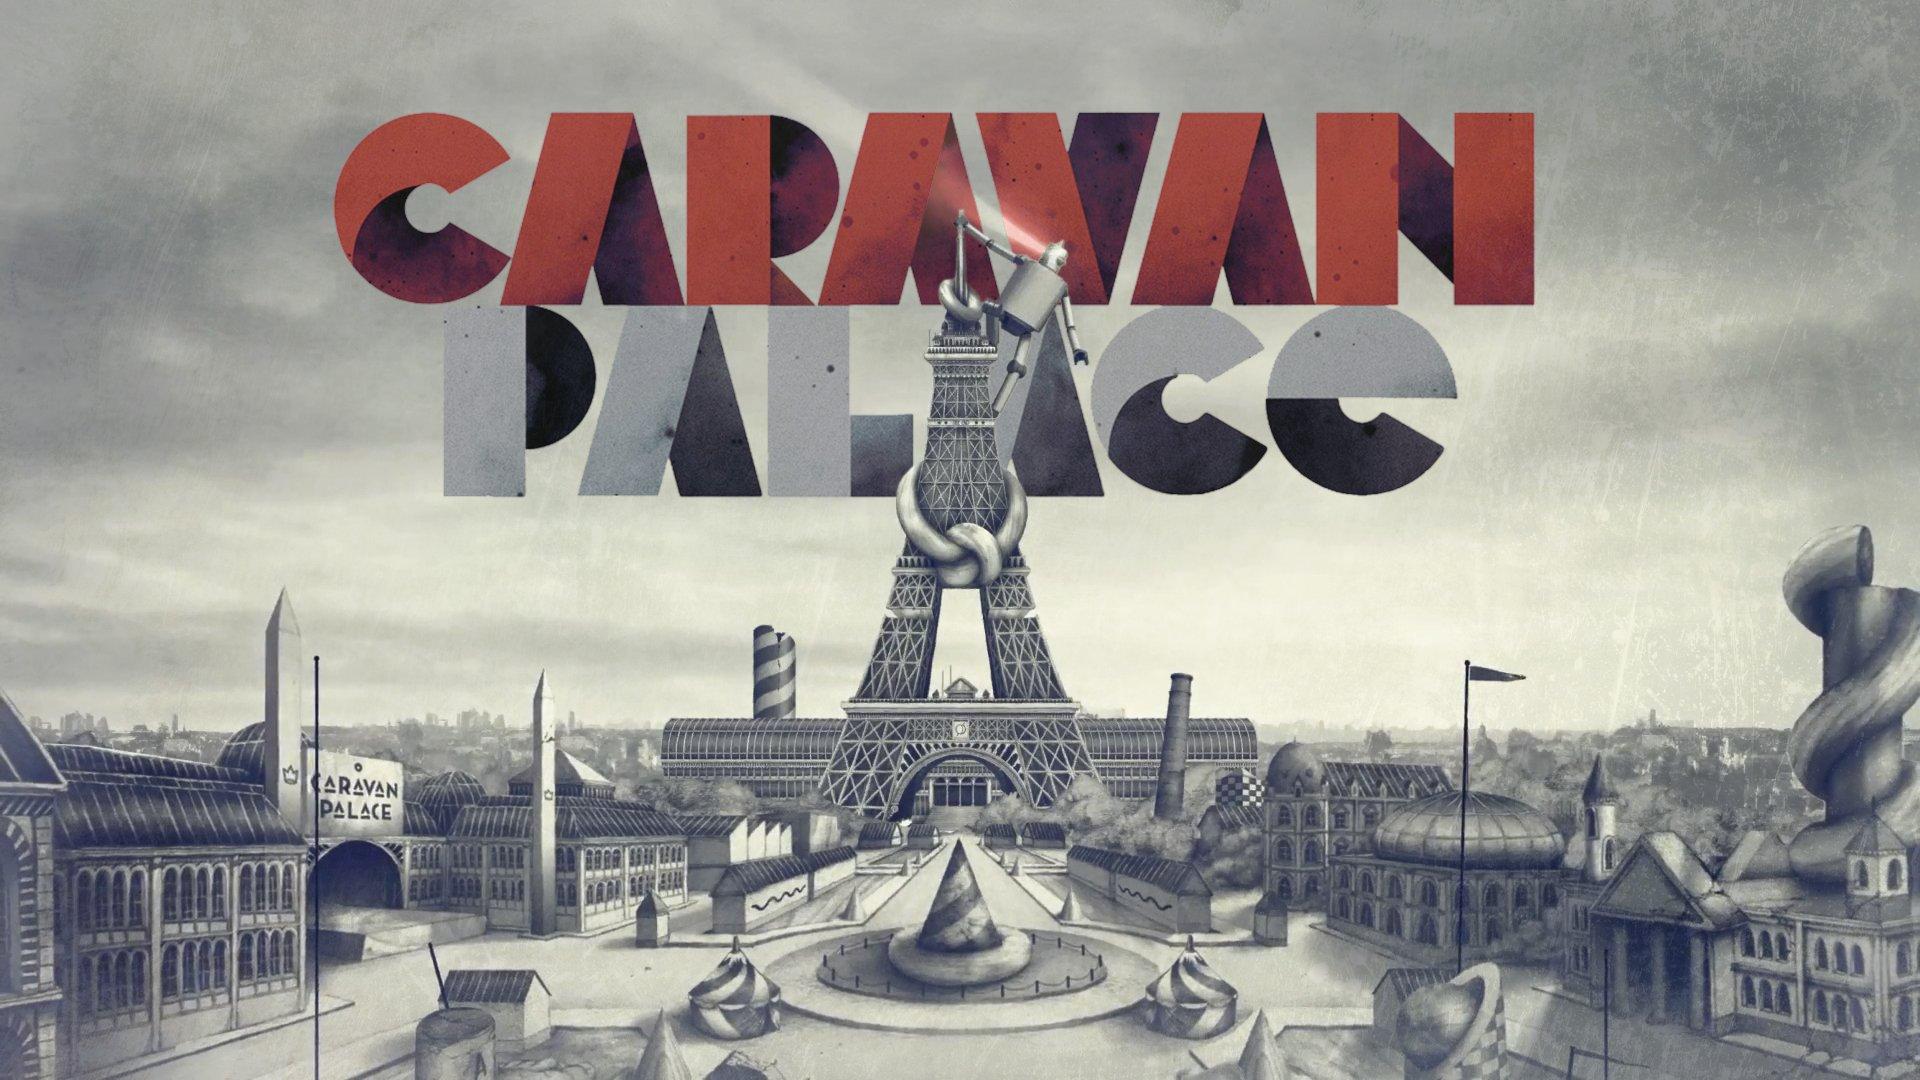 Caravan Palace Fondo De Pantalla Hd Fondo De Escritorio